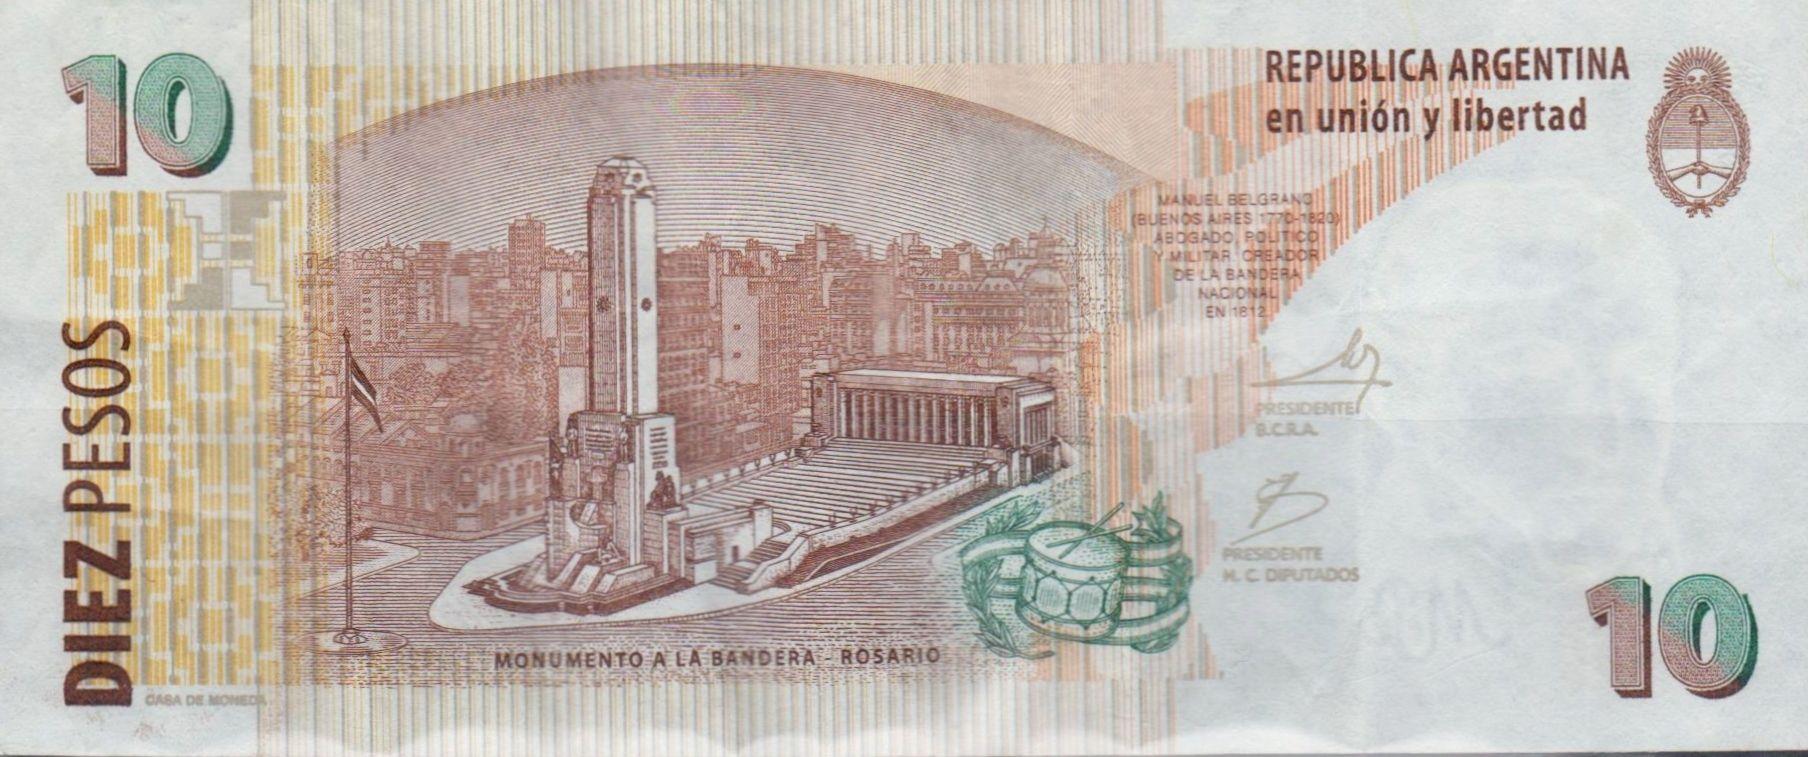 Argentina, 10 Pesos Banknote, 2003. (reverse) Argentina